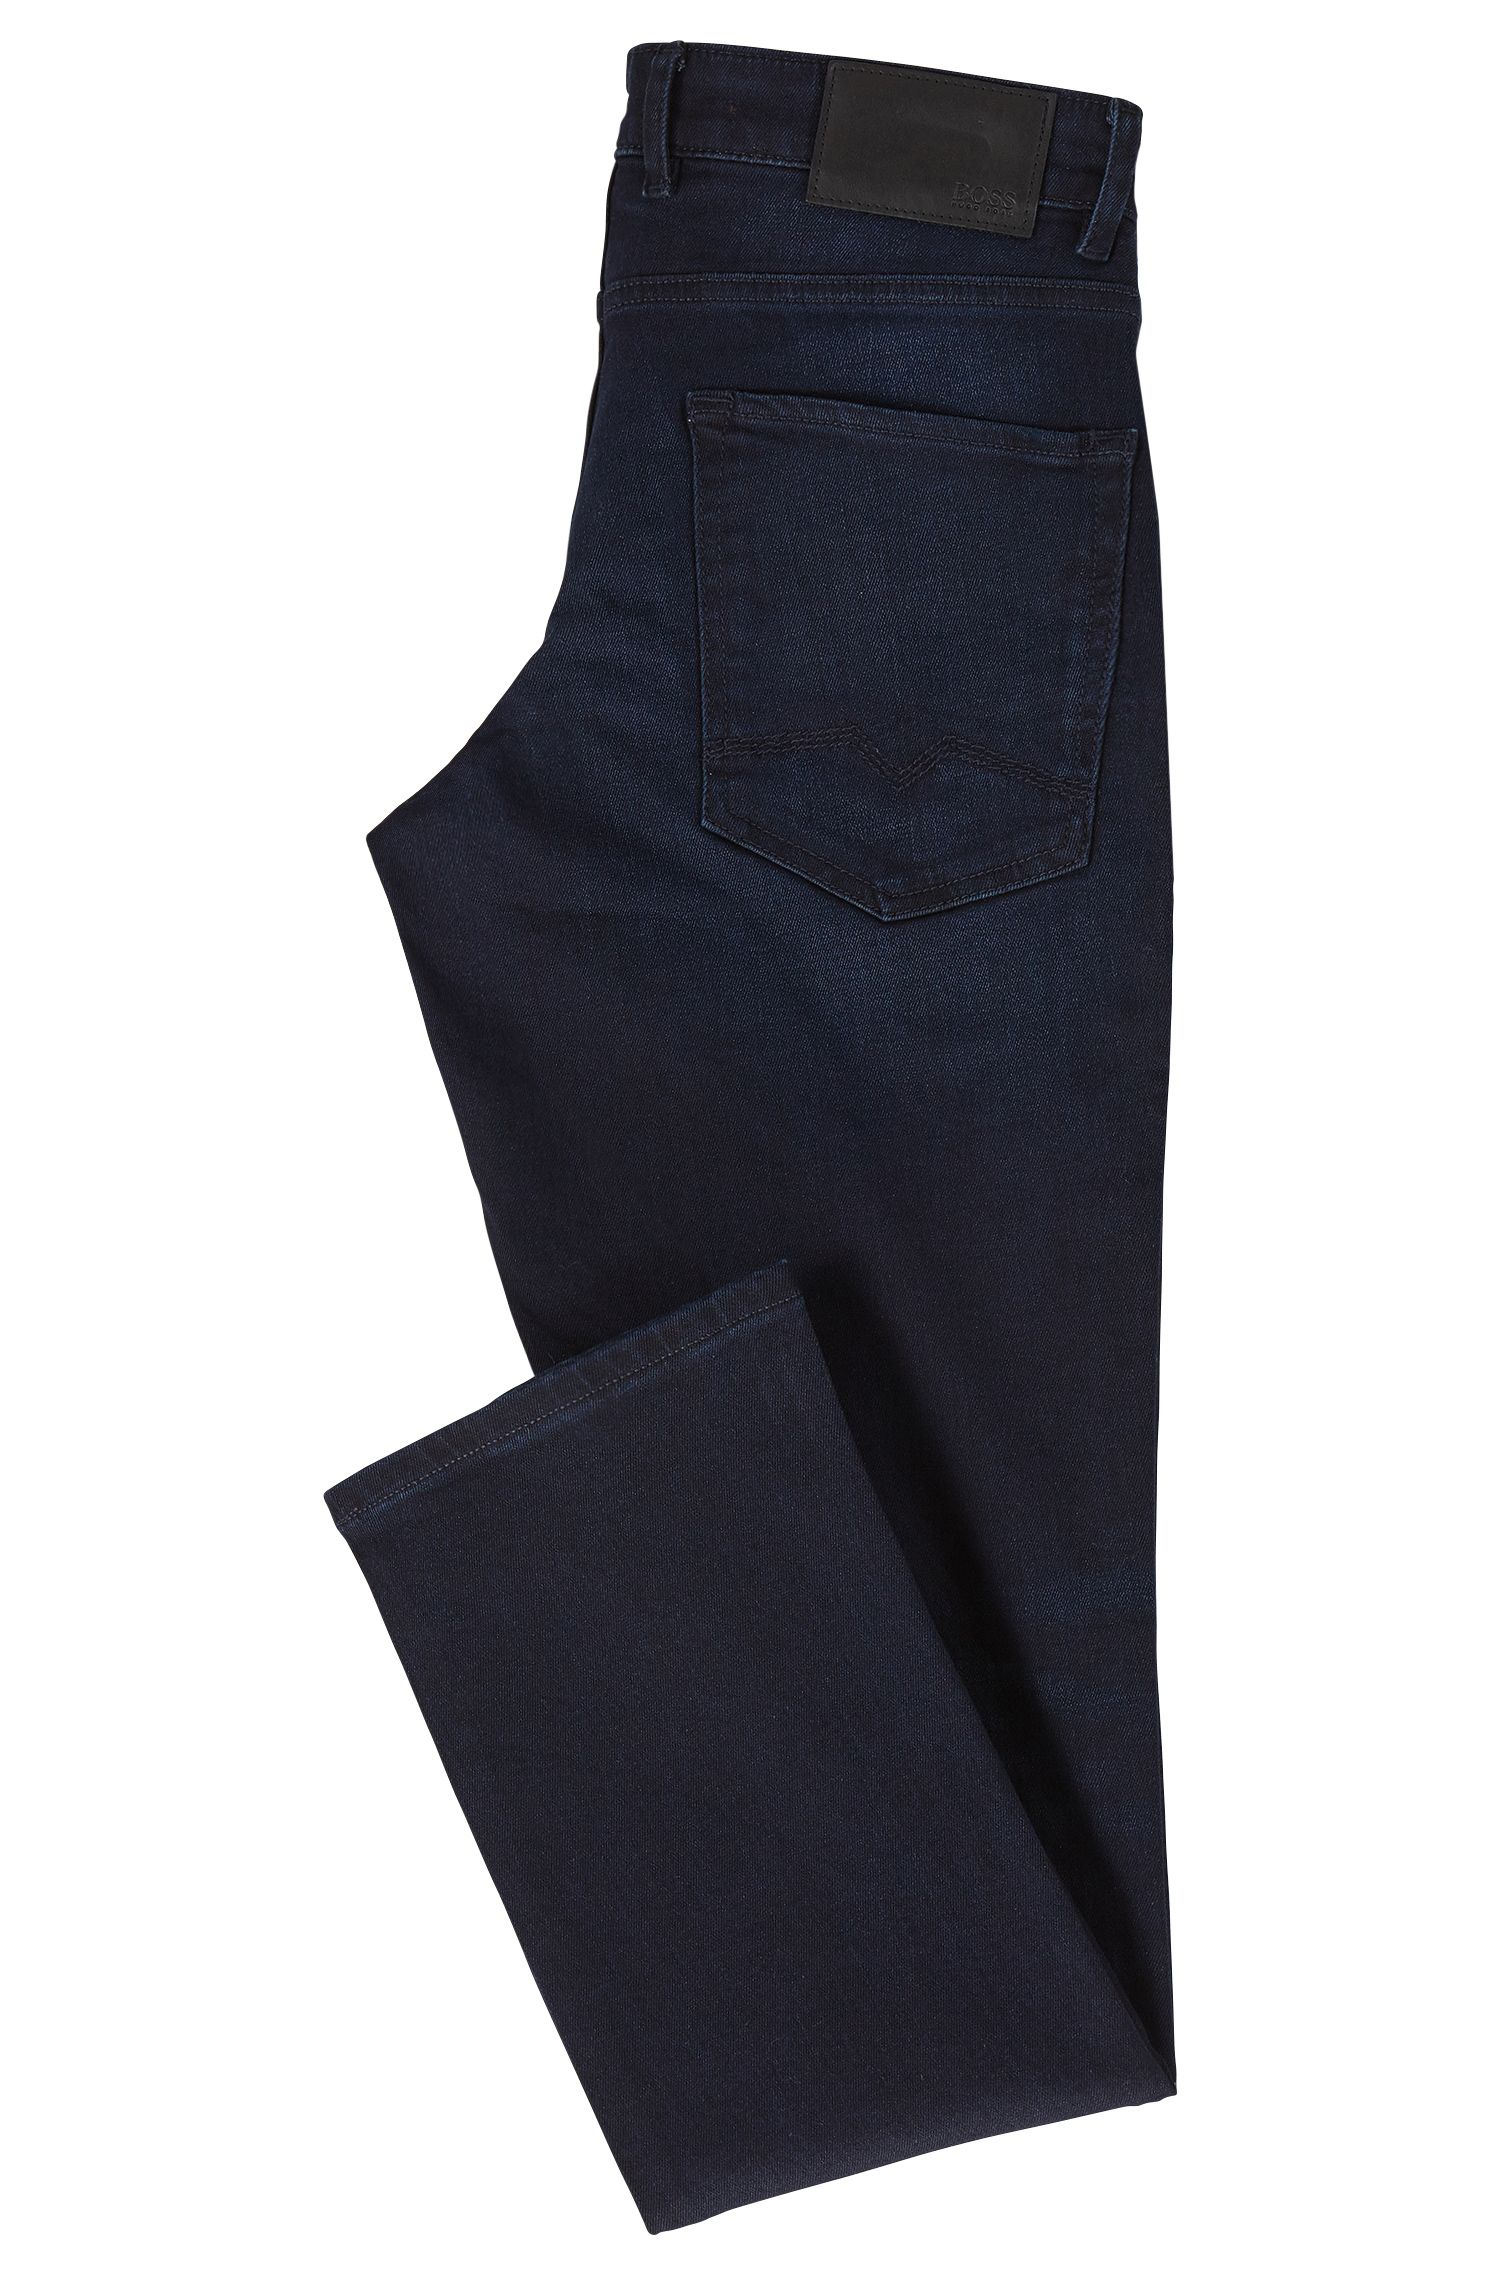 Distressed blue-black comfort stretch denim jeans in a regular fit BOSS